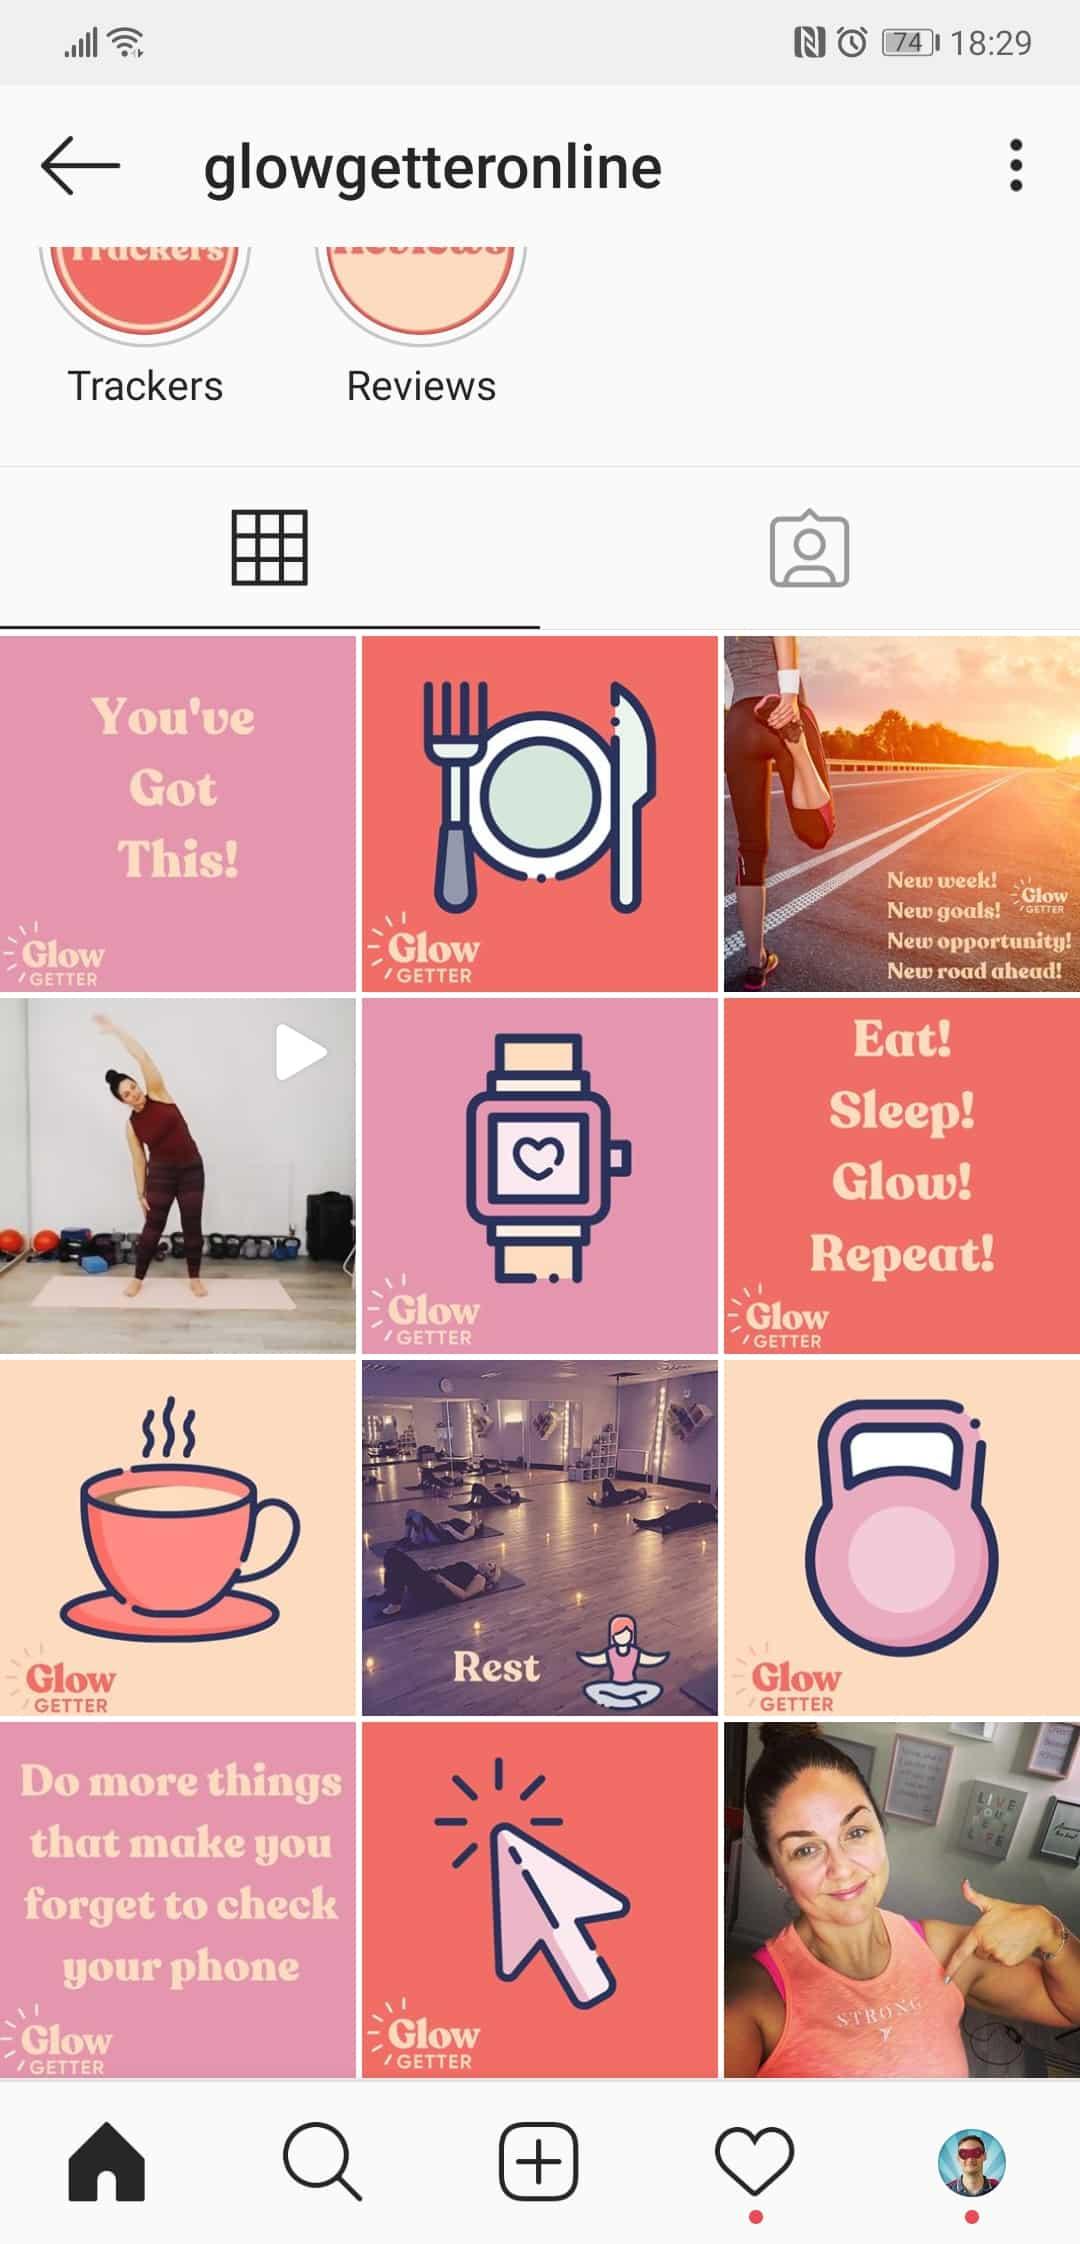 social media buzz for glow getter on instagram